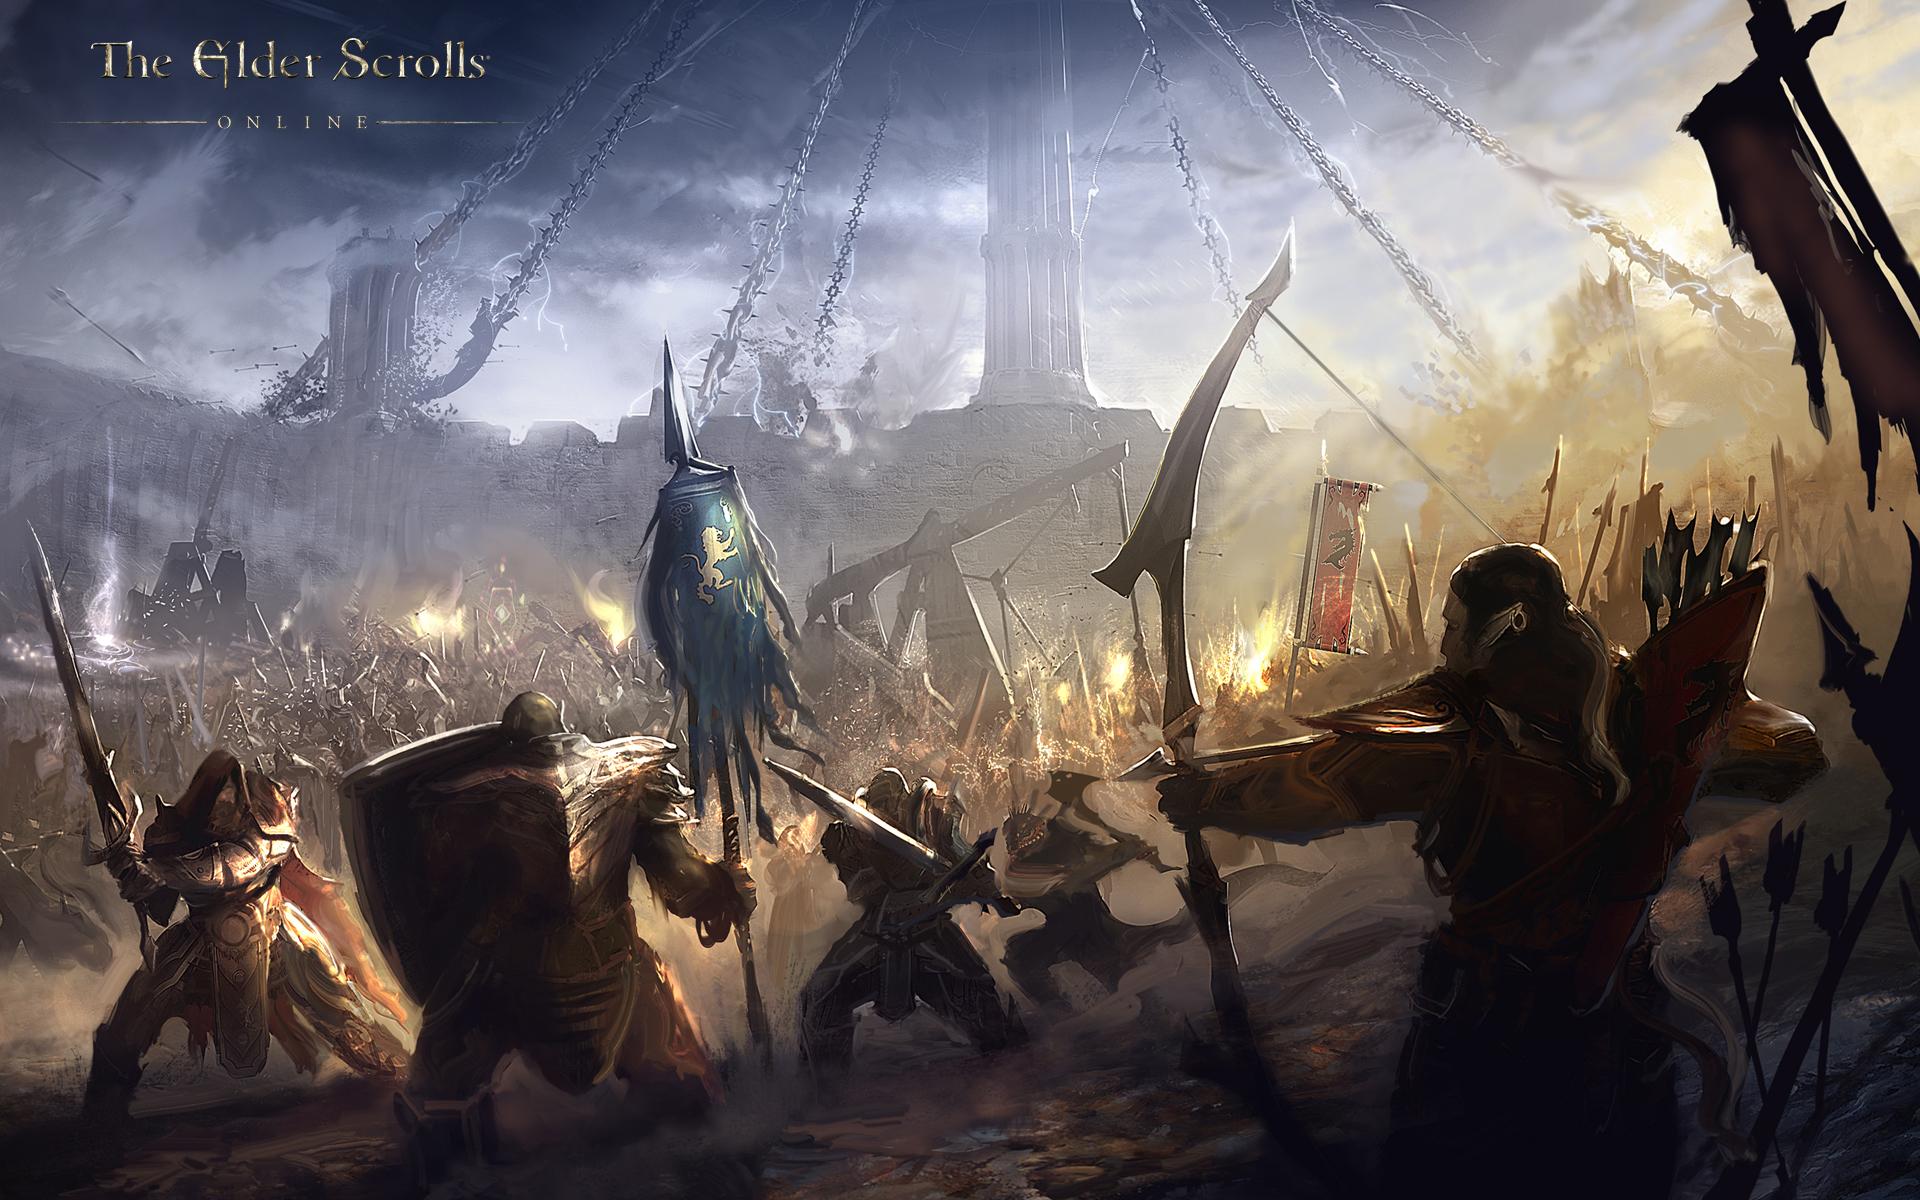 The Elder Scrolls Online Wallpaper 01